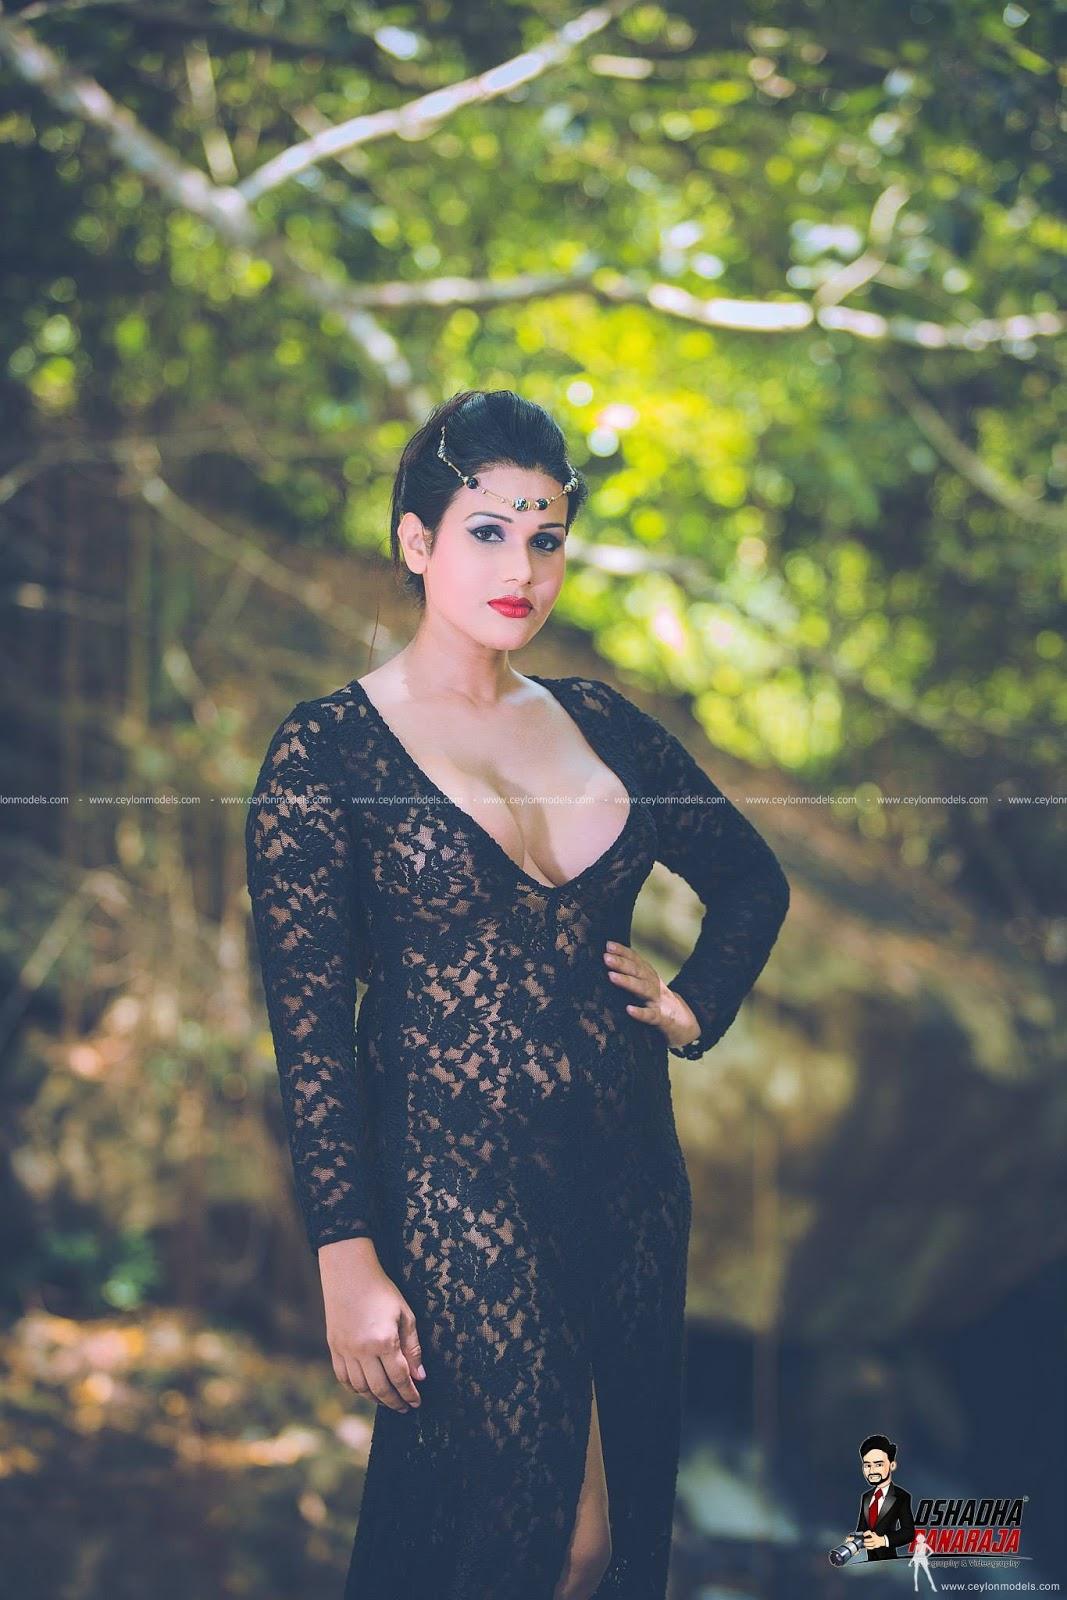 sri lankan model transparent black dress photo shoot hot model wet in water photo shoot chami asanka model hot photo collection on ceylon models page